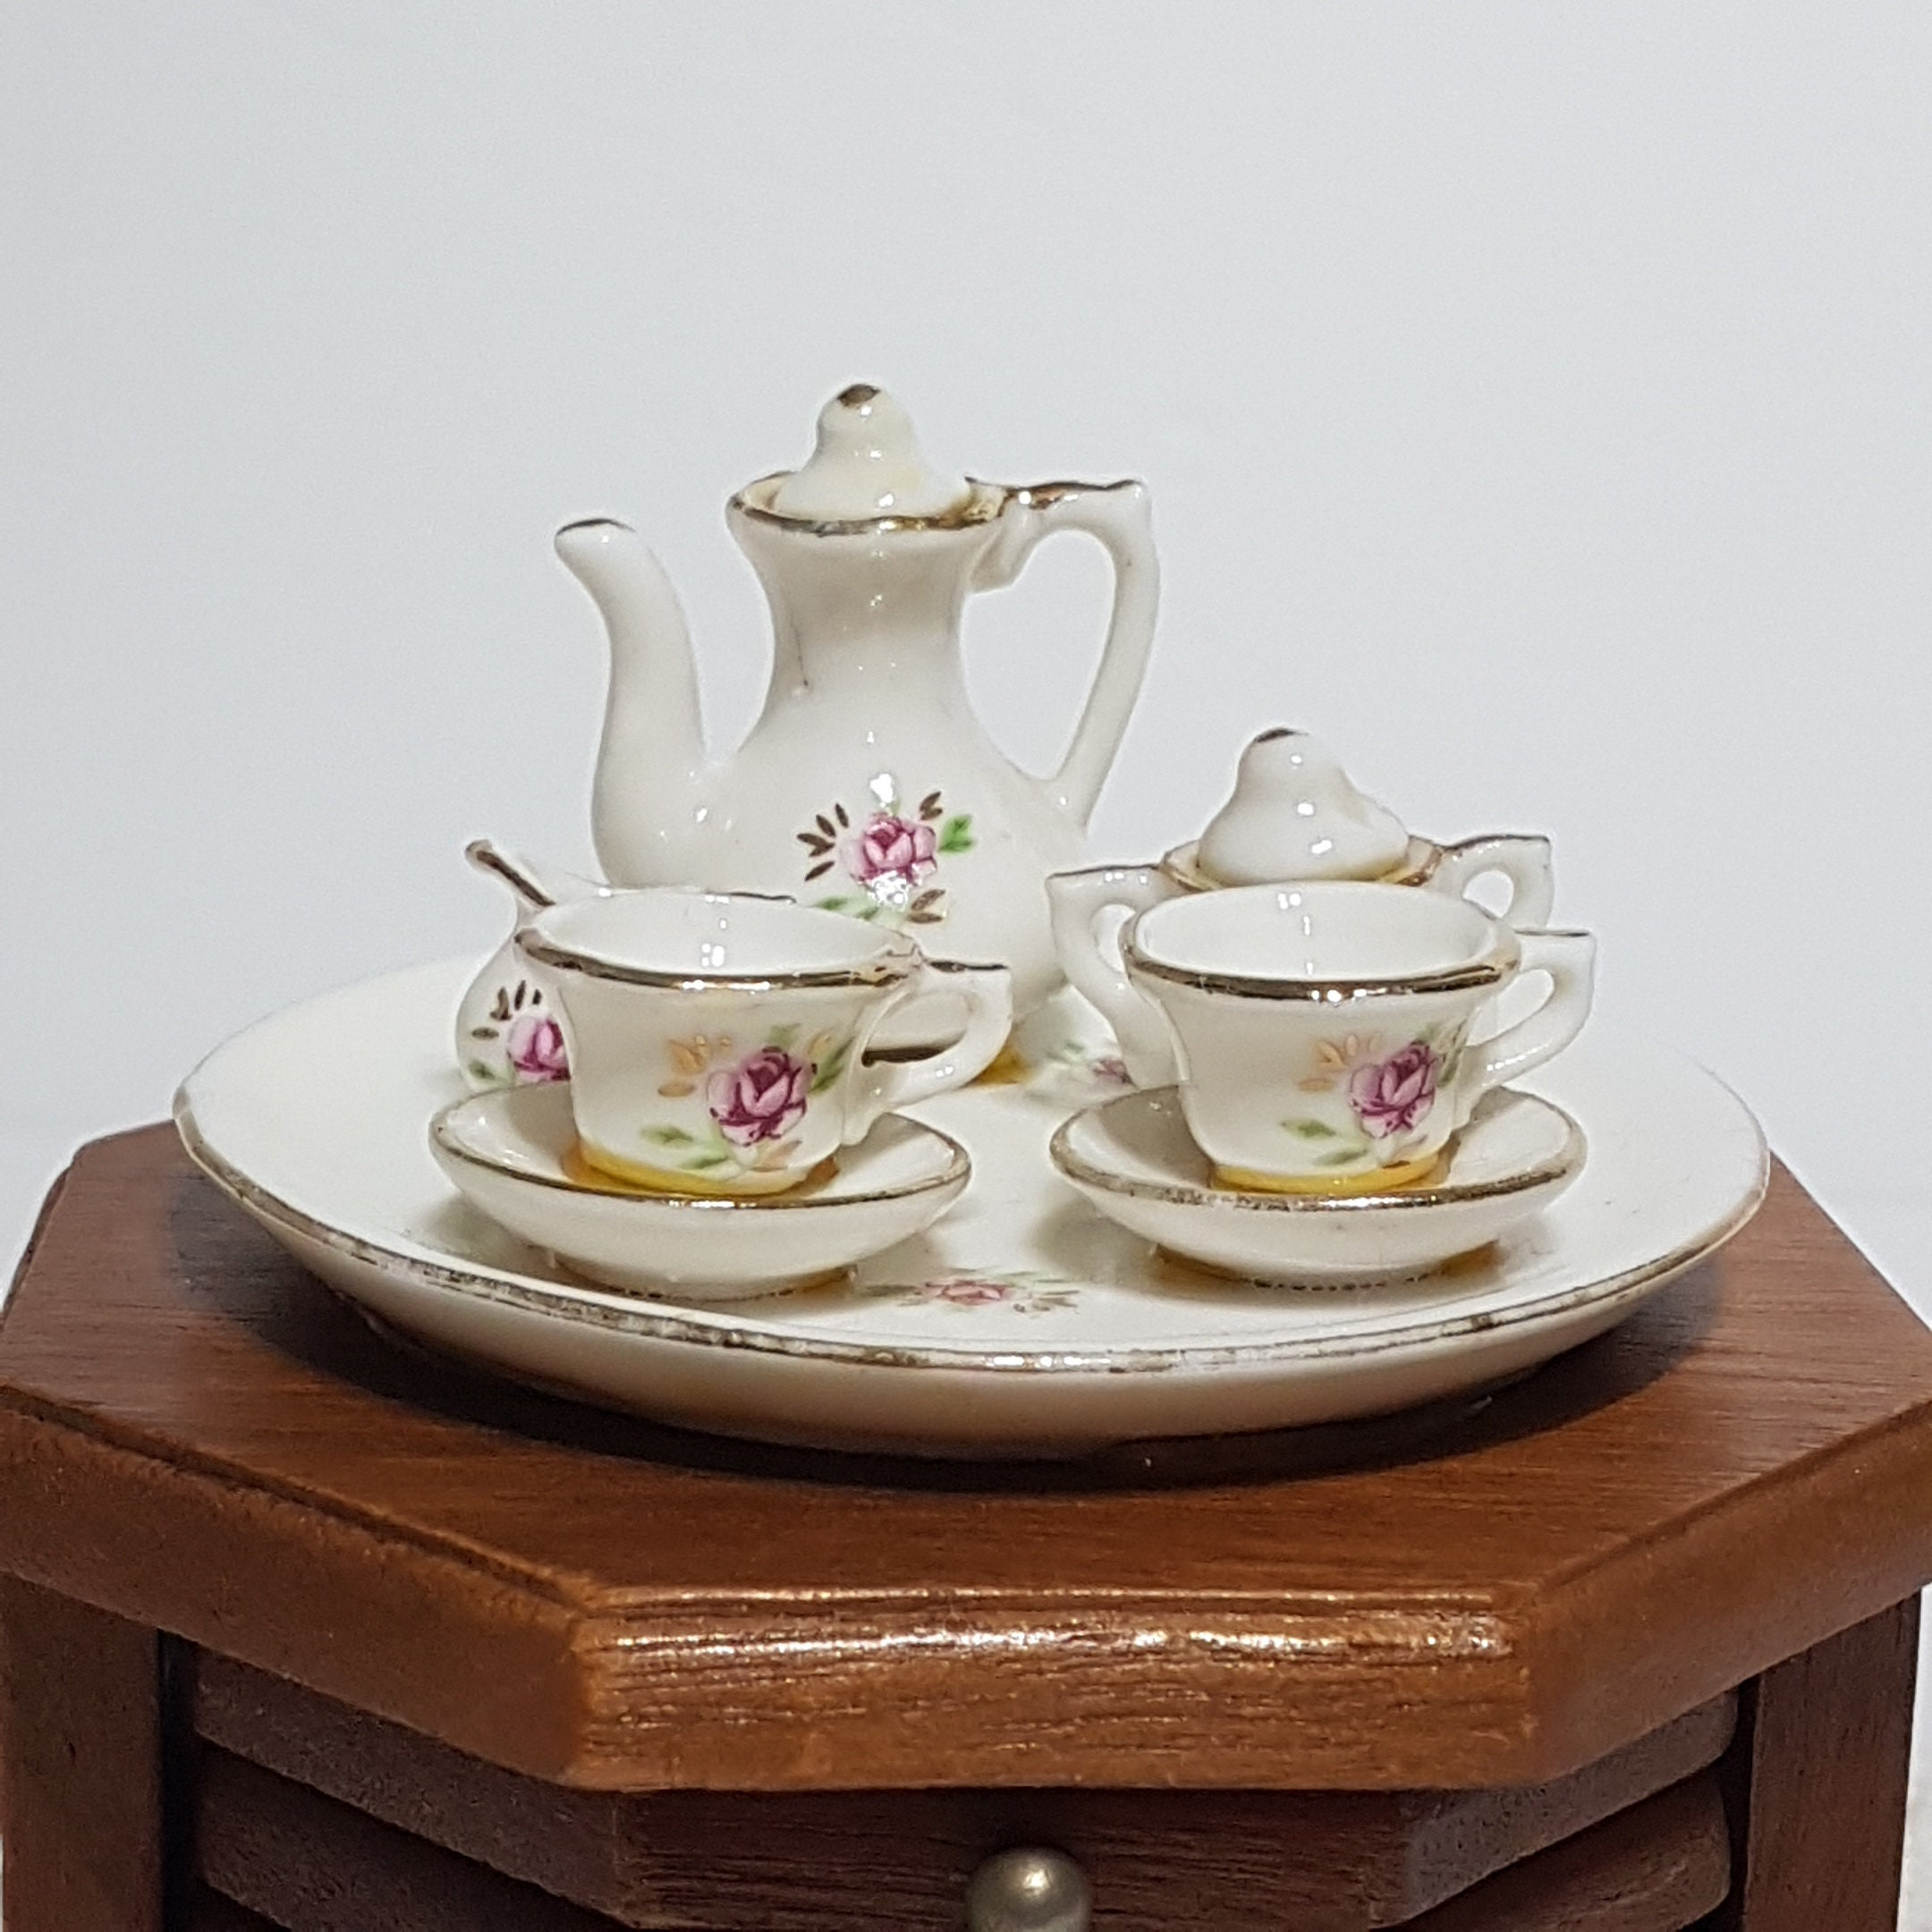 Kitchen Table Home Decoration Accessory Vintage Wood Cork Coaster Set with Miniature Tea Set Top 1970s